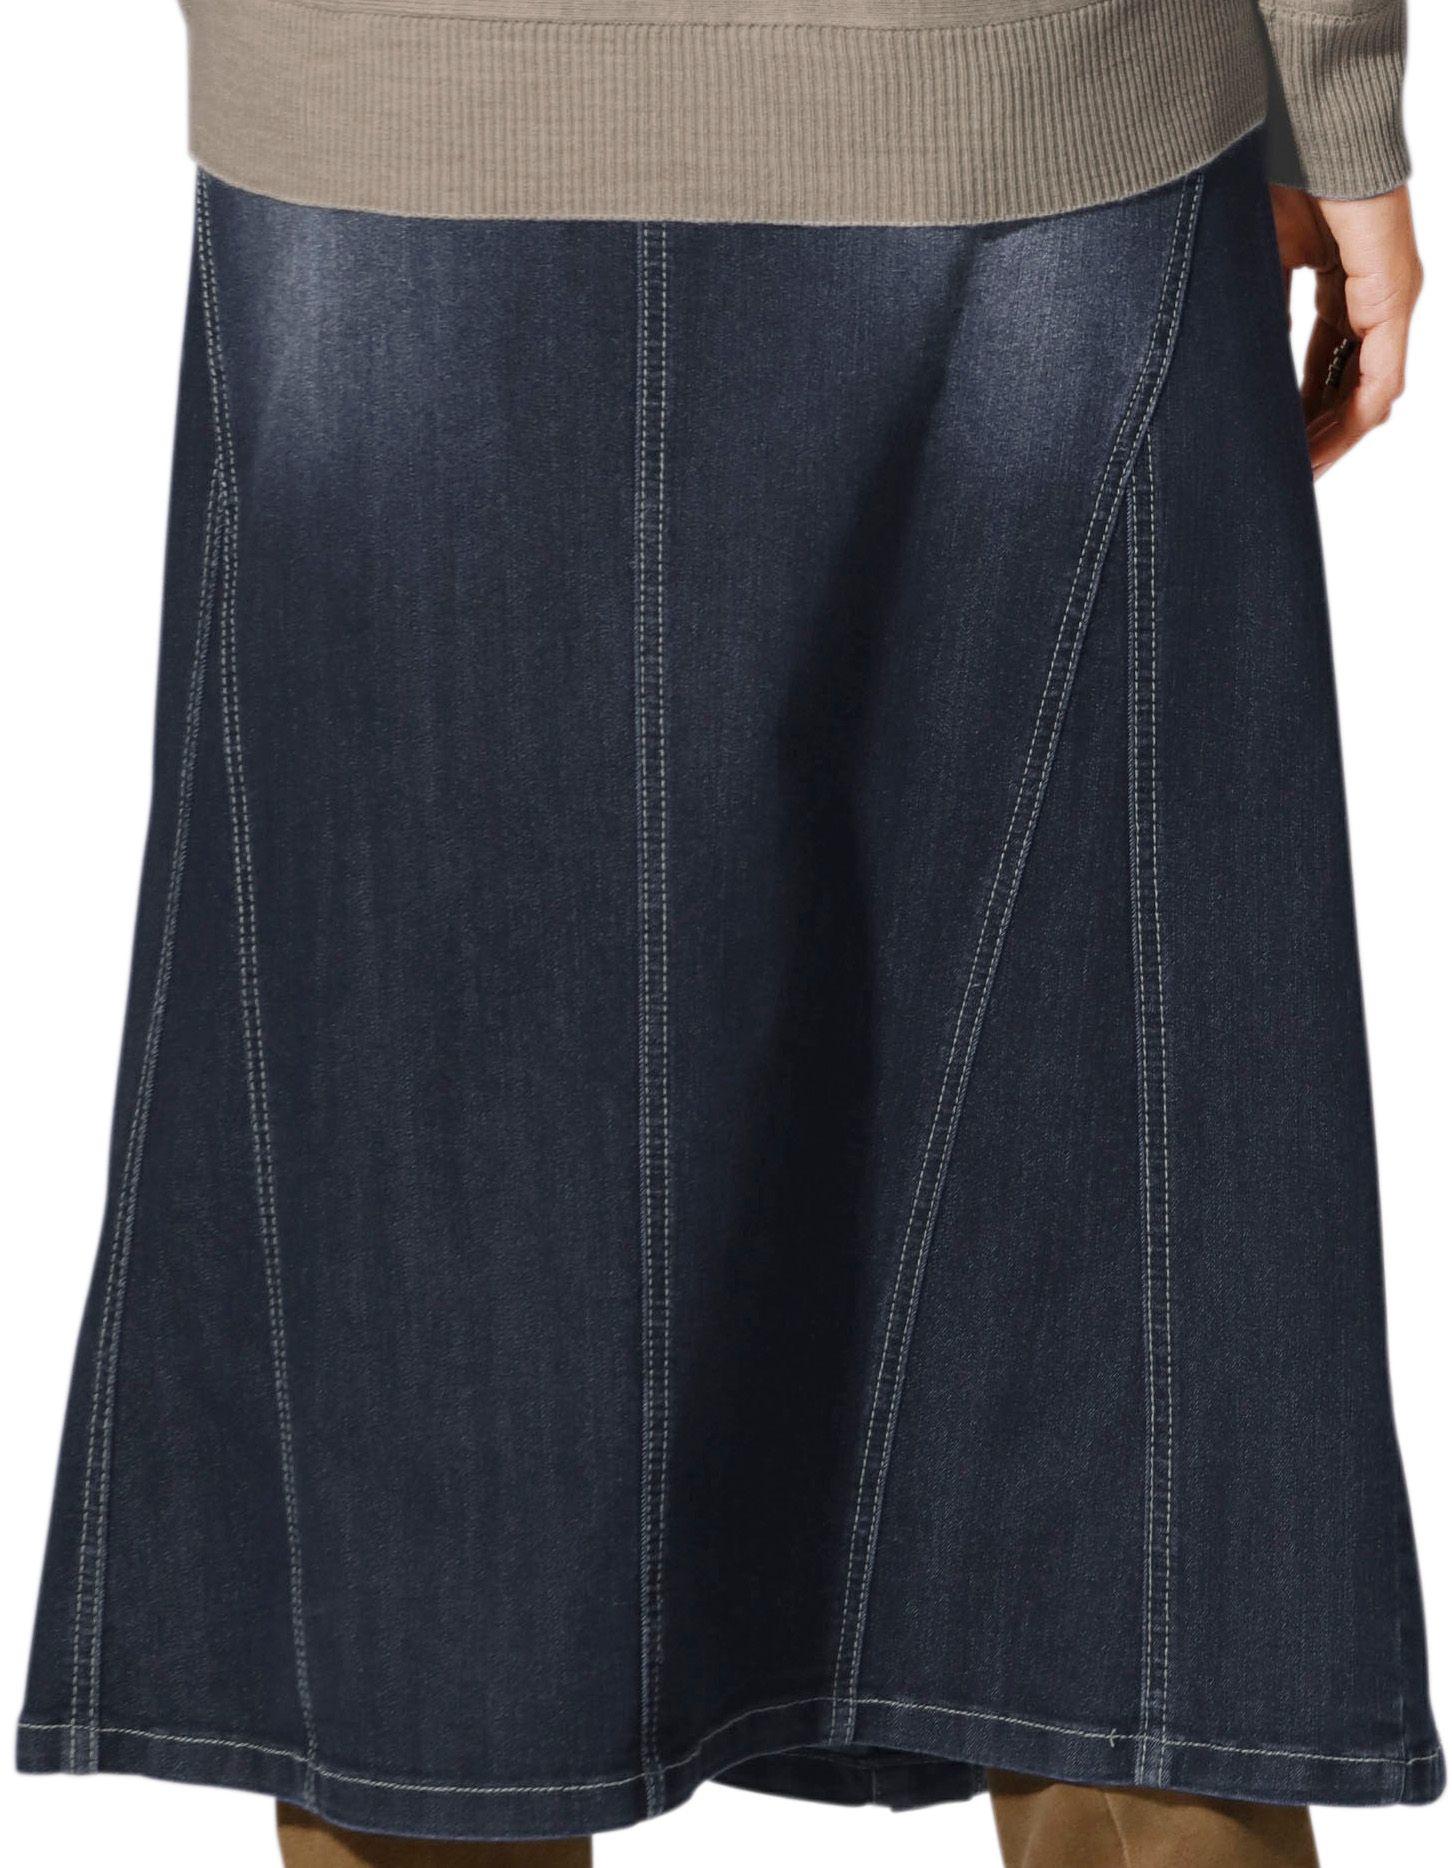 CLASSIC INSPIRATIONEN Classic Inspirationen Jeans-Rock in leichter A-Form